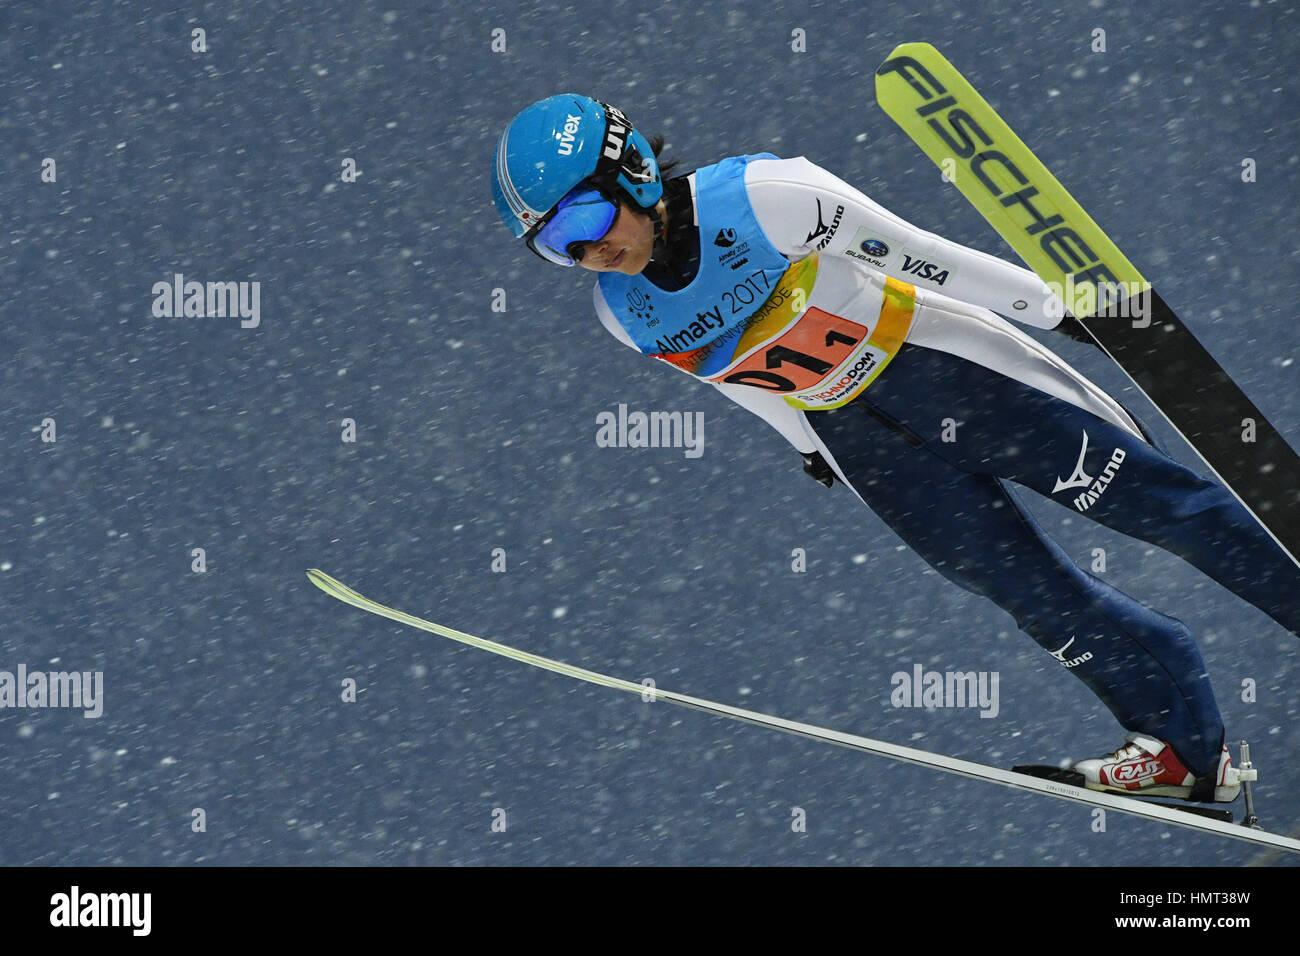 Sunkar internacional complejo de salto de esquí, Almaty, Kazajstán. 4 Feb, 2017. Jun Maruyama (JPN), 4 de febrero Foto de stock